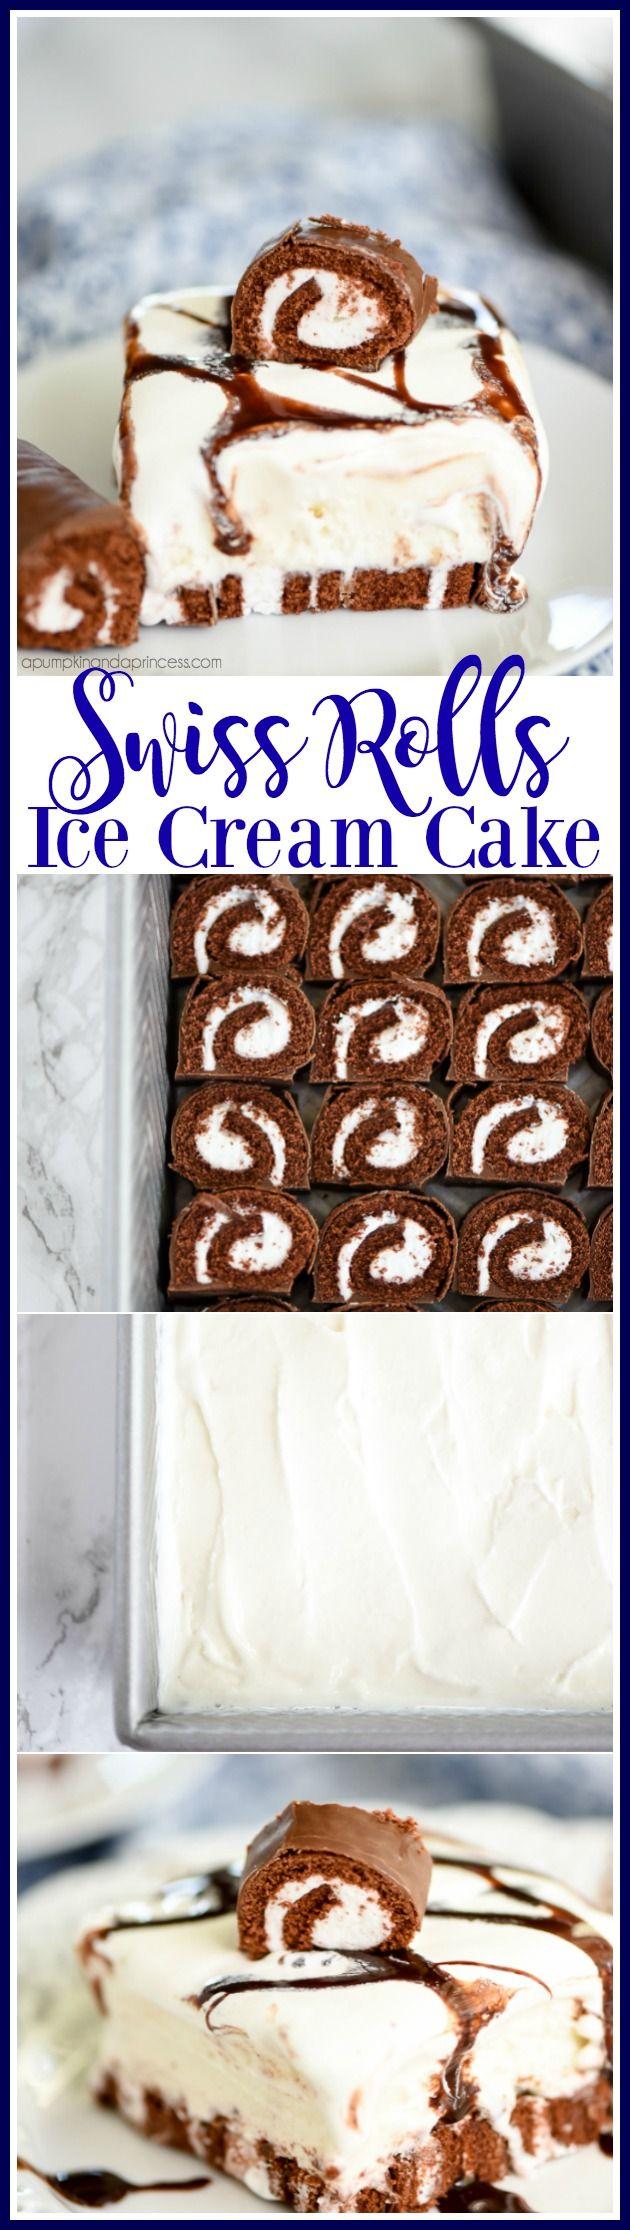 Swiss Rolls Ice Cream Cake - This easy ice cream cake recipe is perfect for…